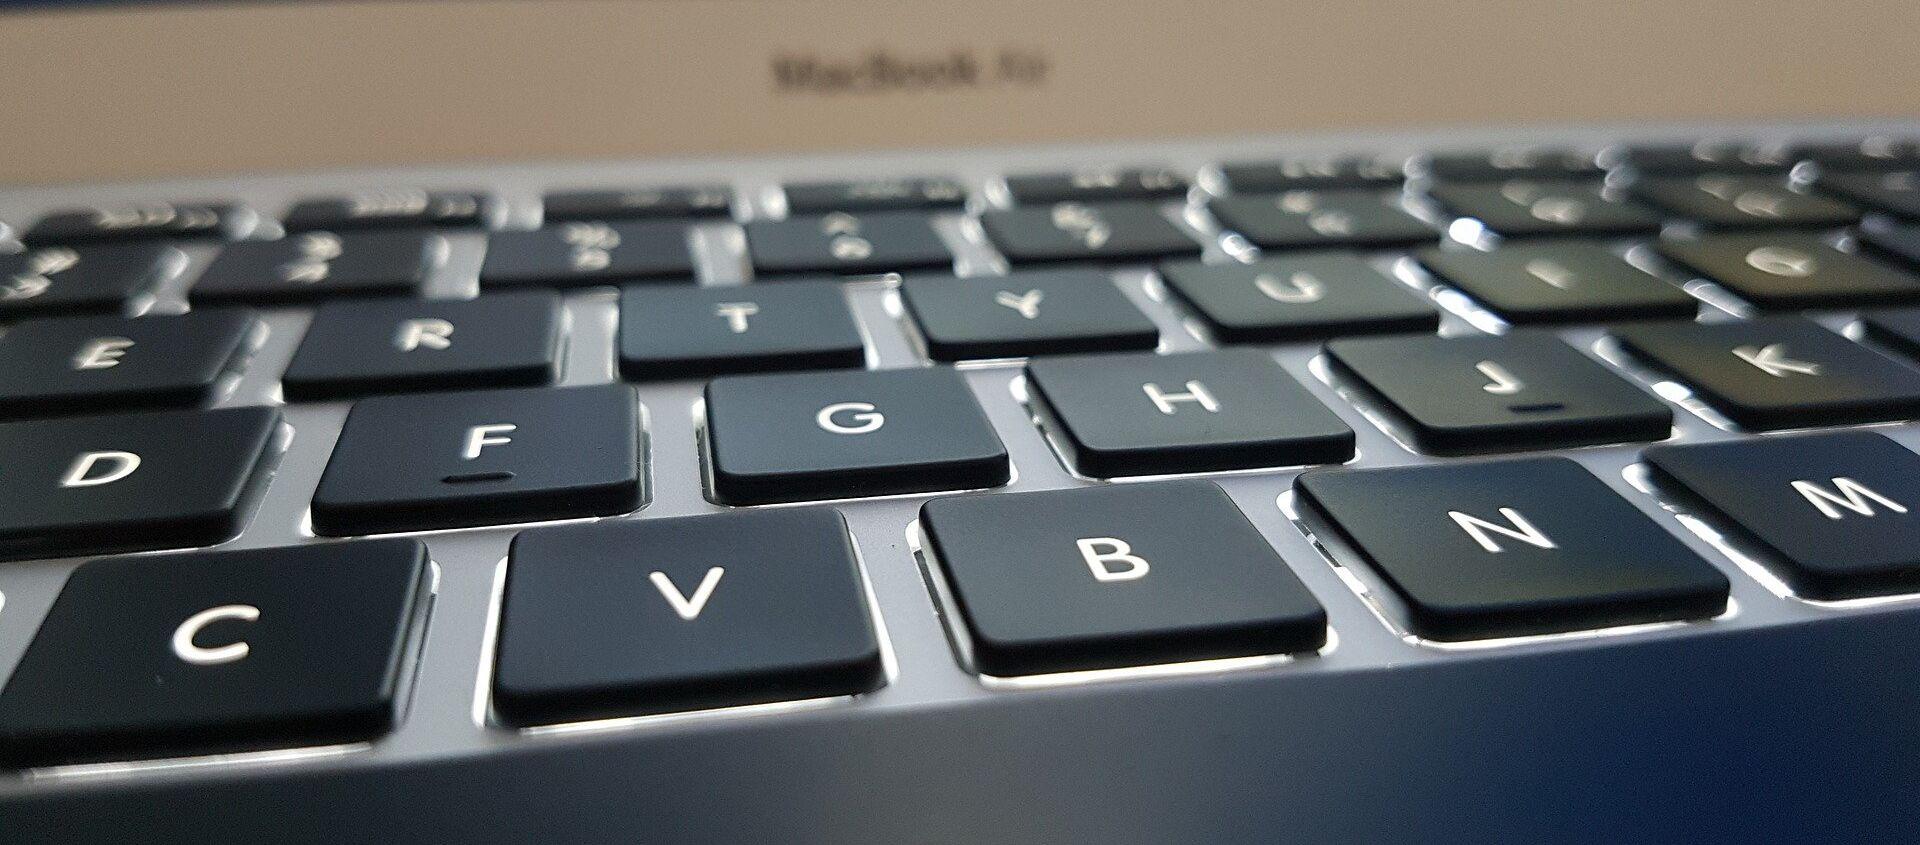 Клавиатура ноутбука, архивное фото - Sputnik Беларусь, 1920, 12.04.2021